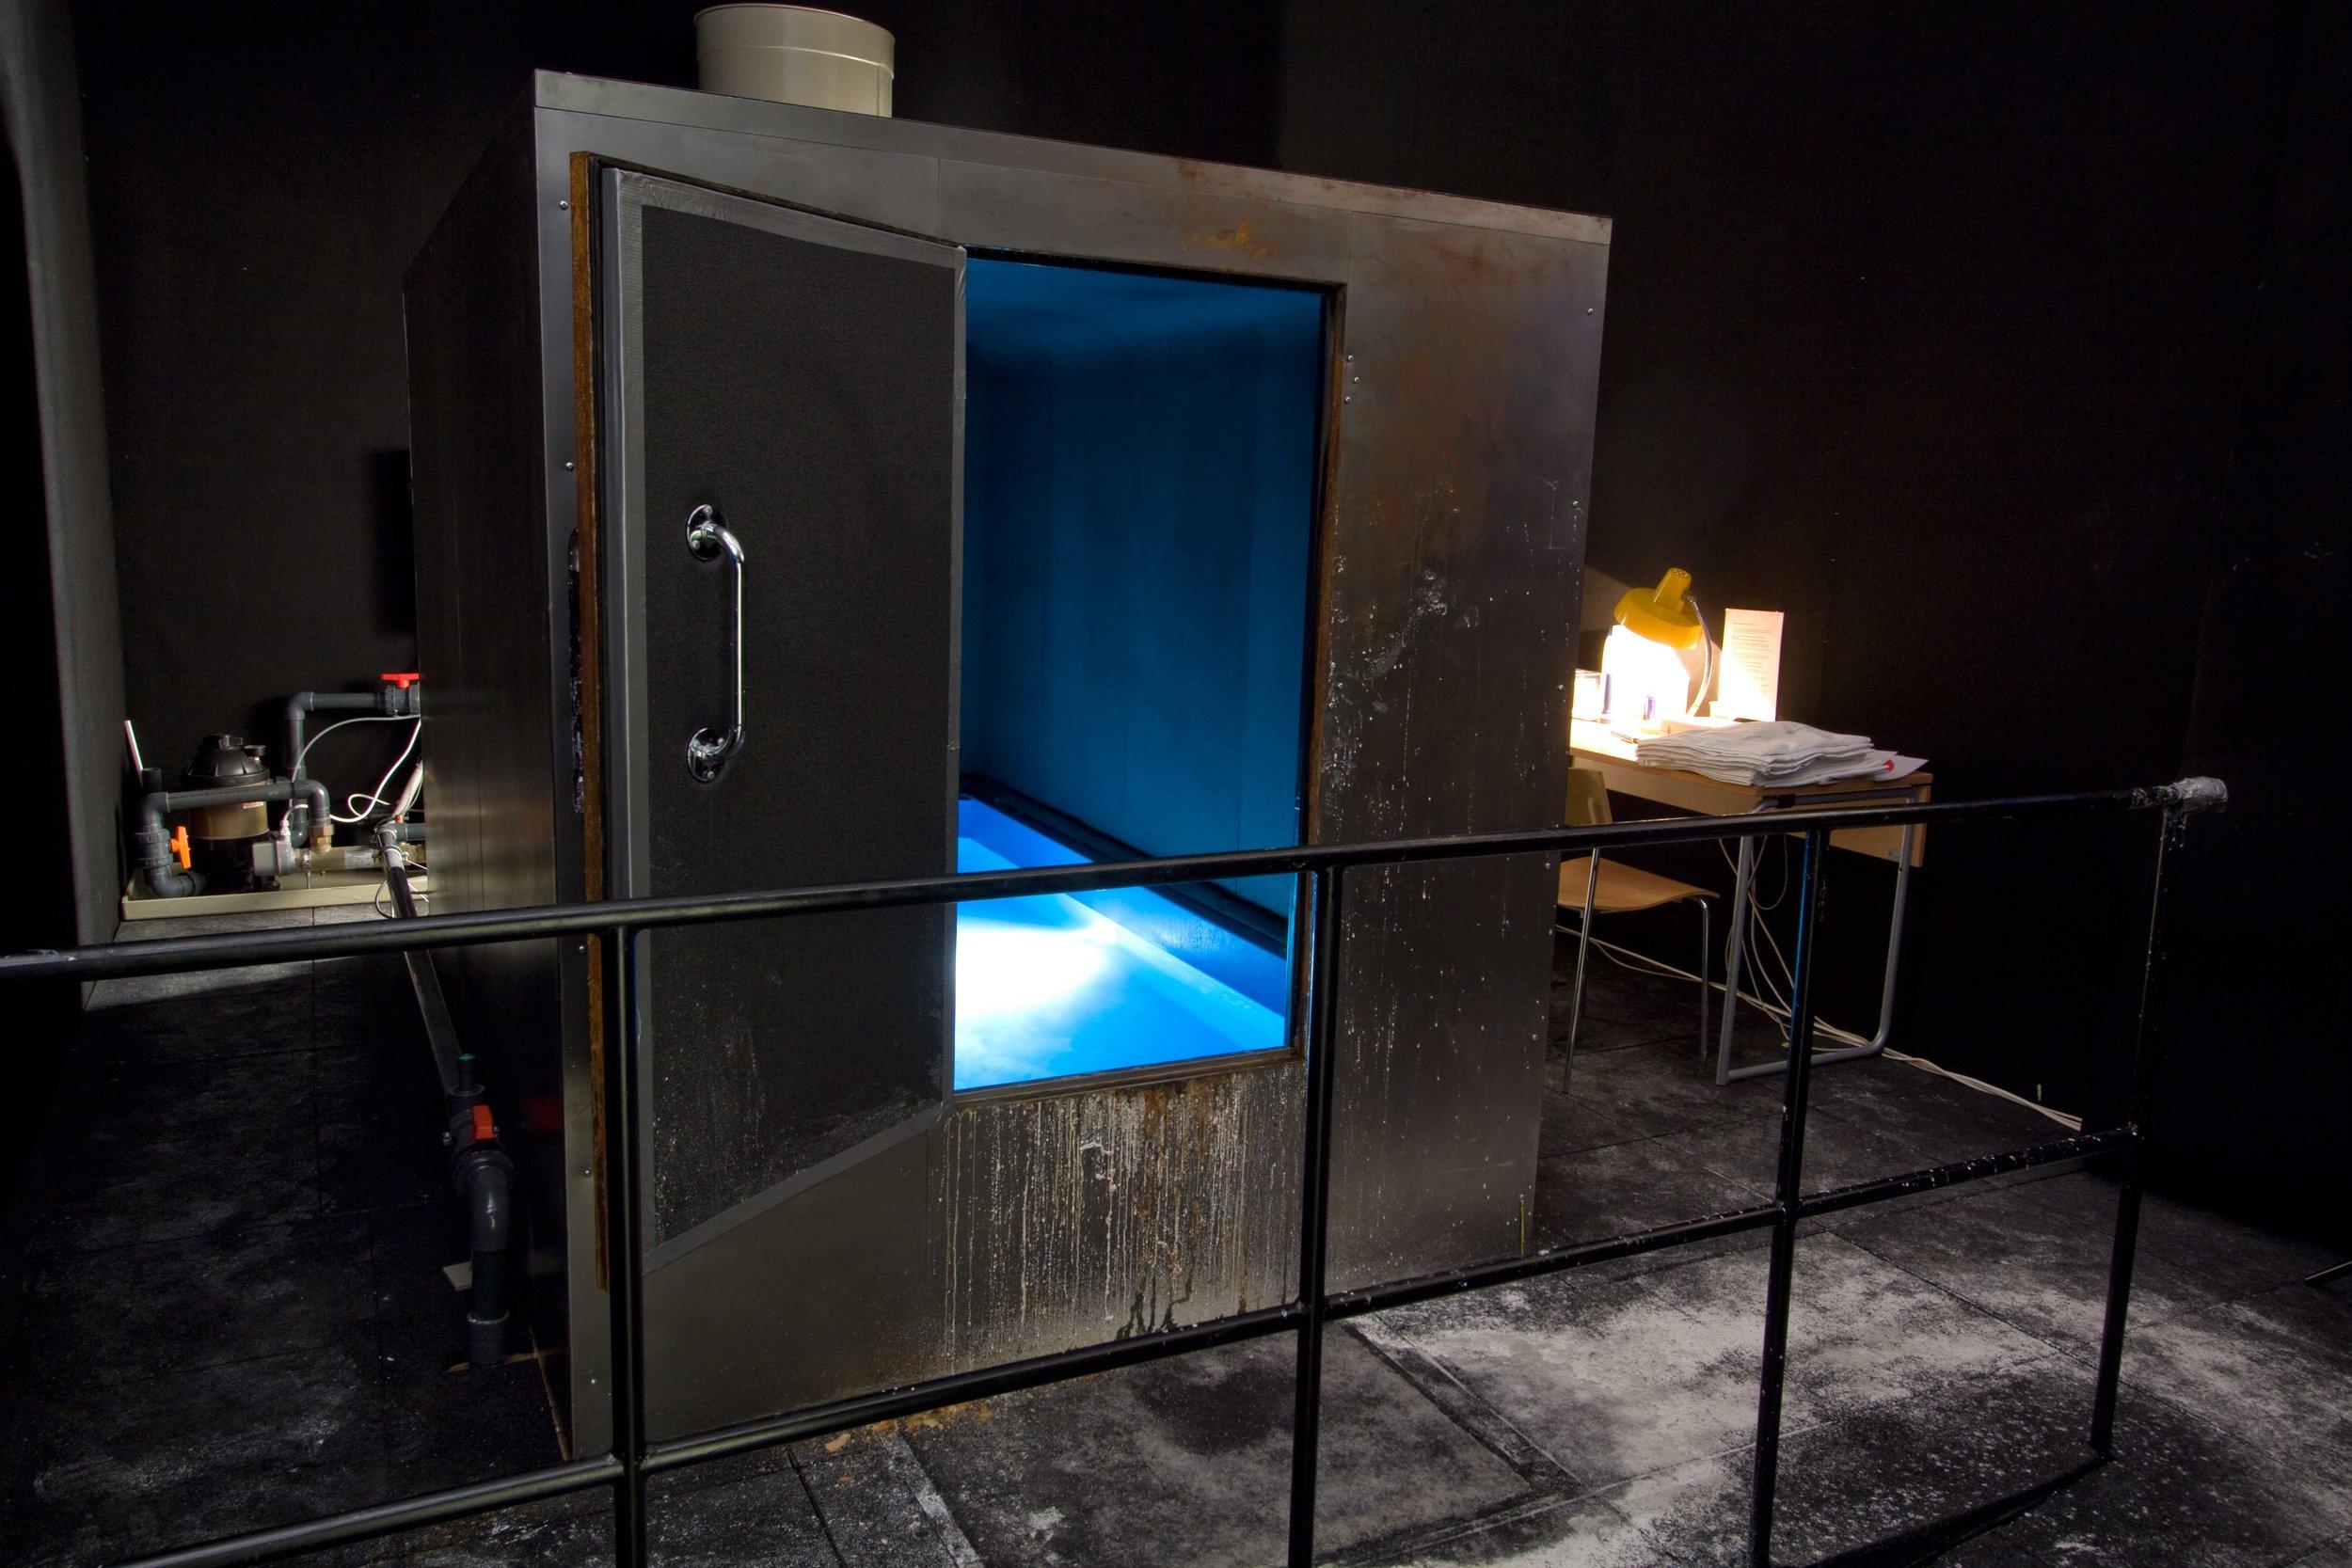 Black Hole 2005, microgravity cabin